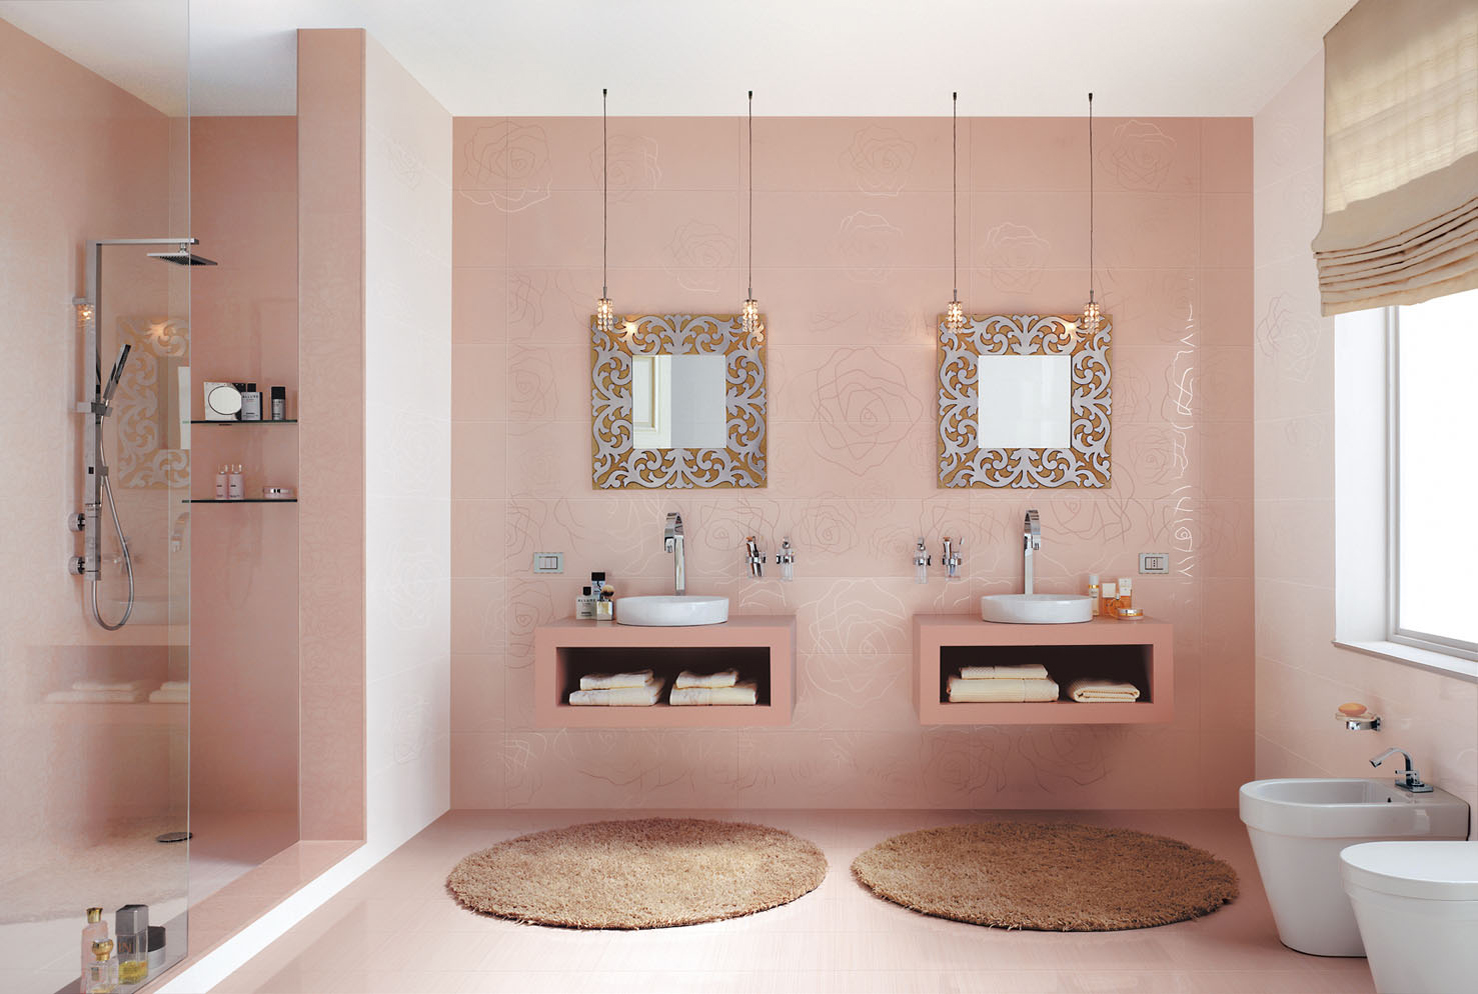 F rd szoba csempe csata 8 egy ri si olasz vattacukor for Cool bathroom ideas for girls